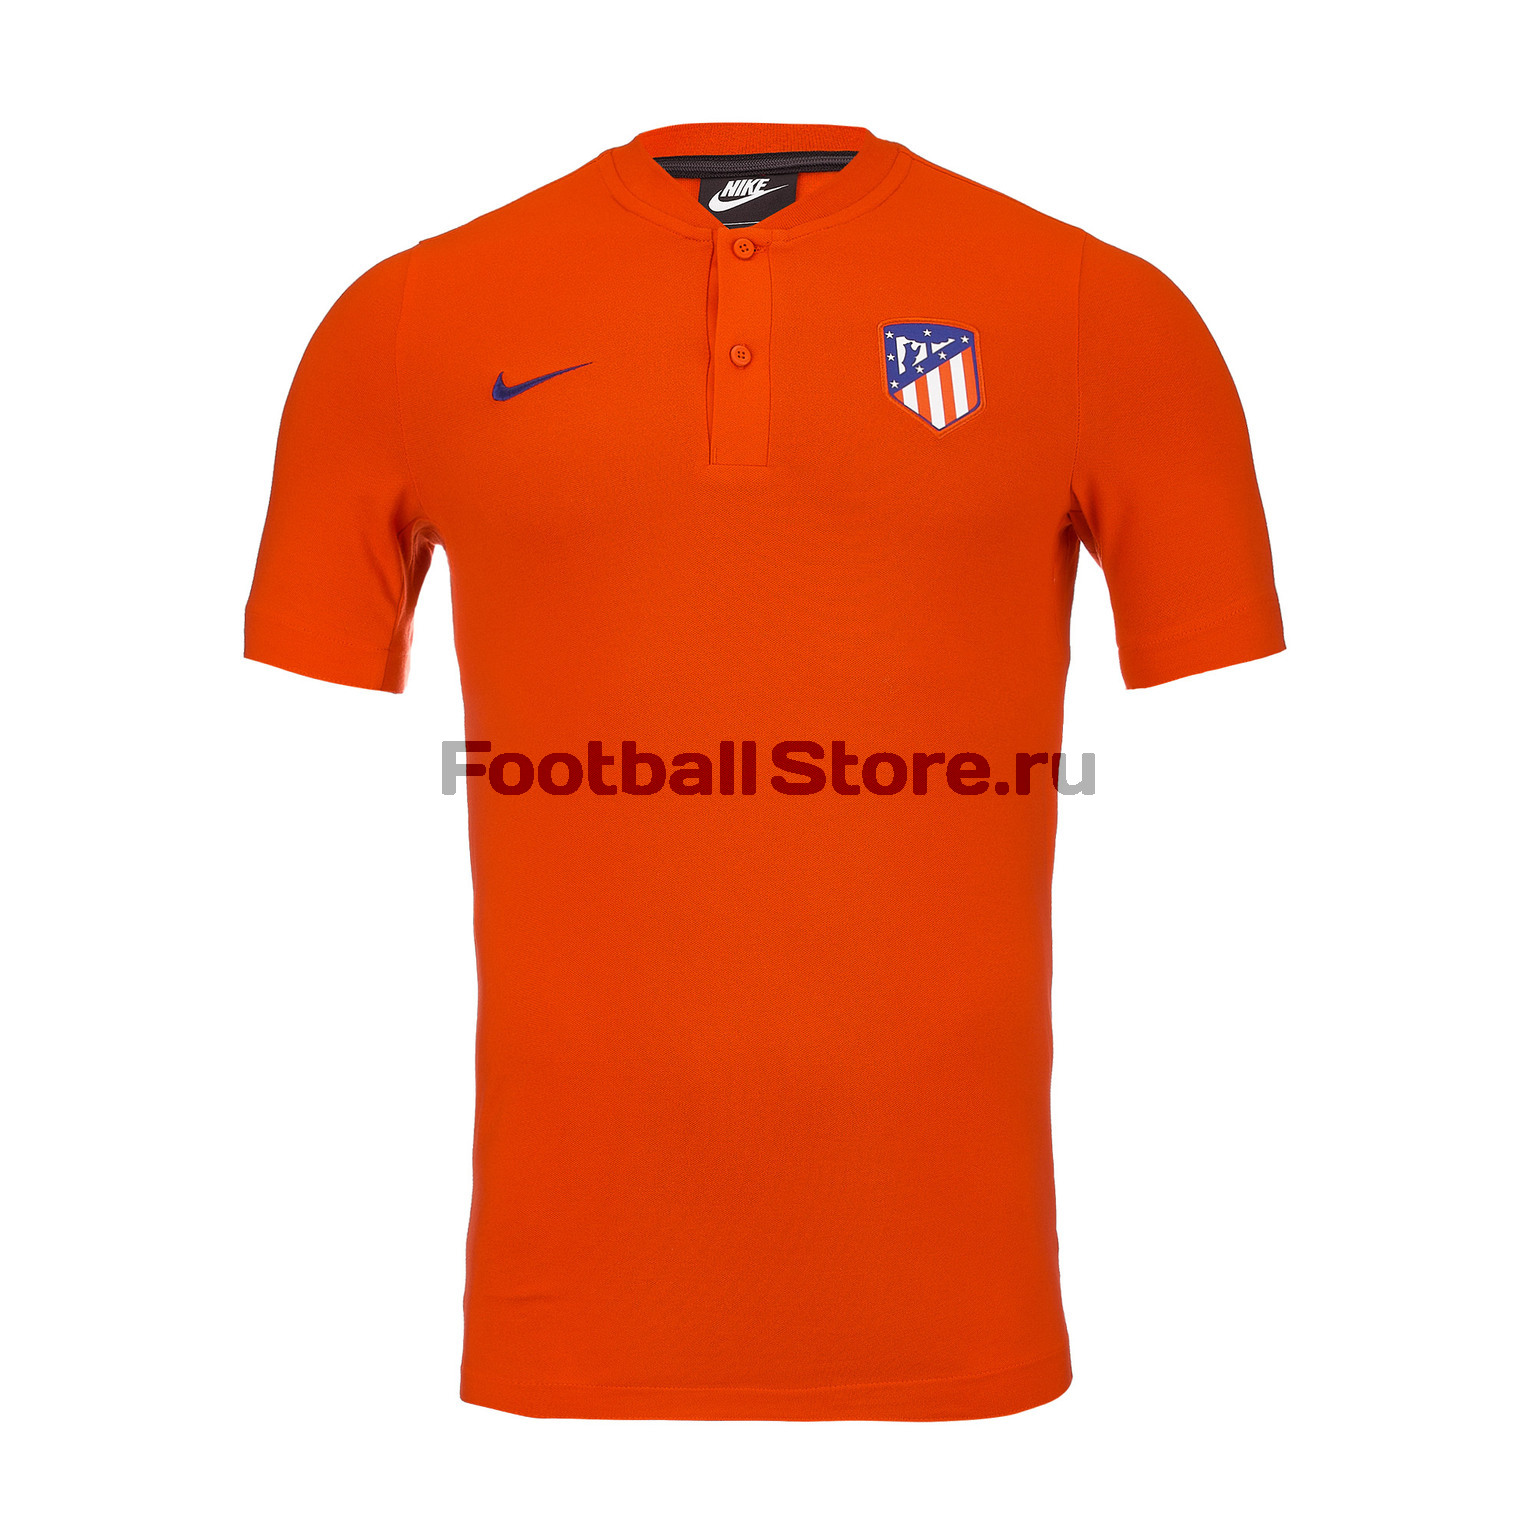 цена на Поло Nike Atletico Madrid AV5254-600